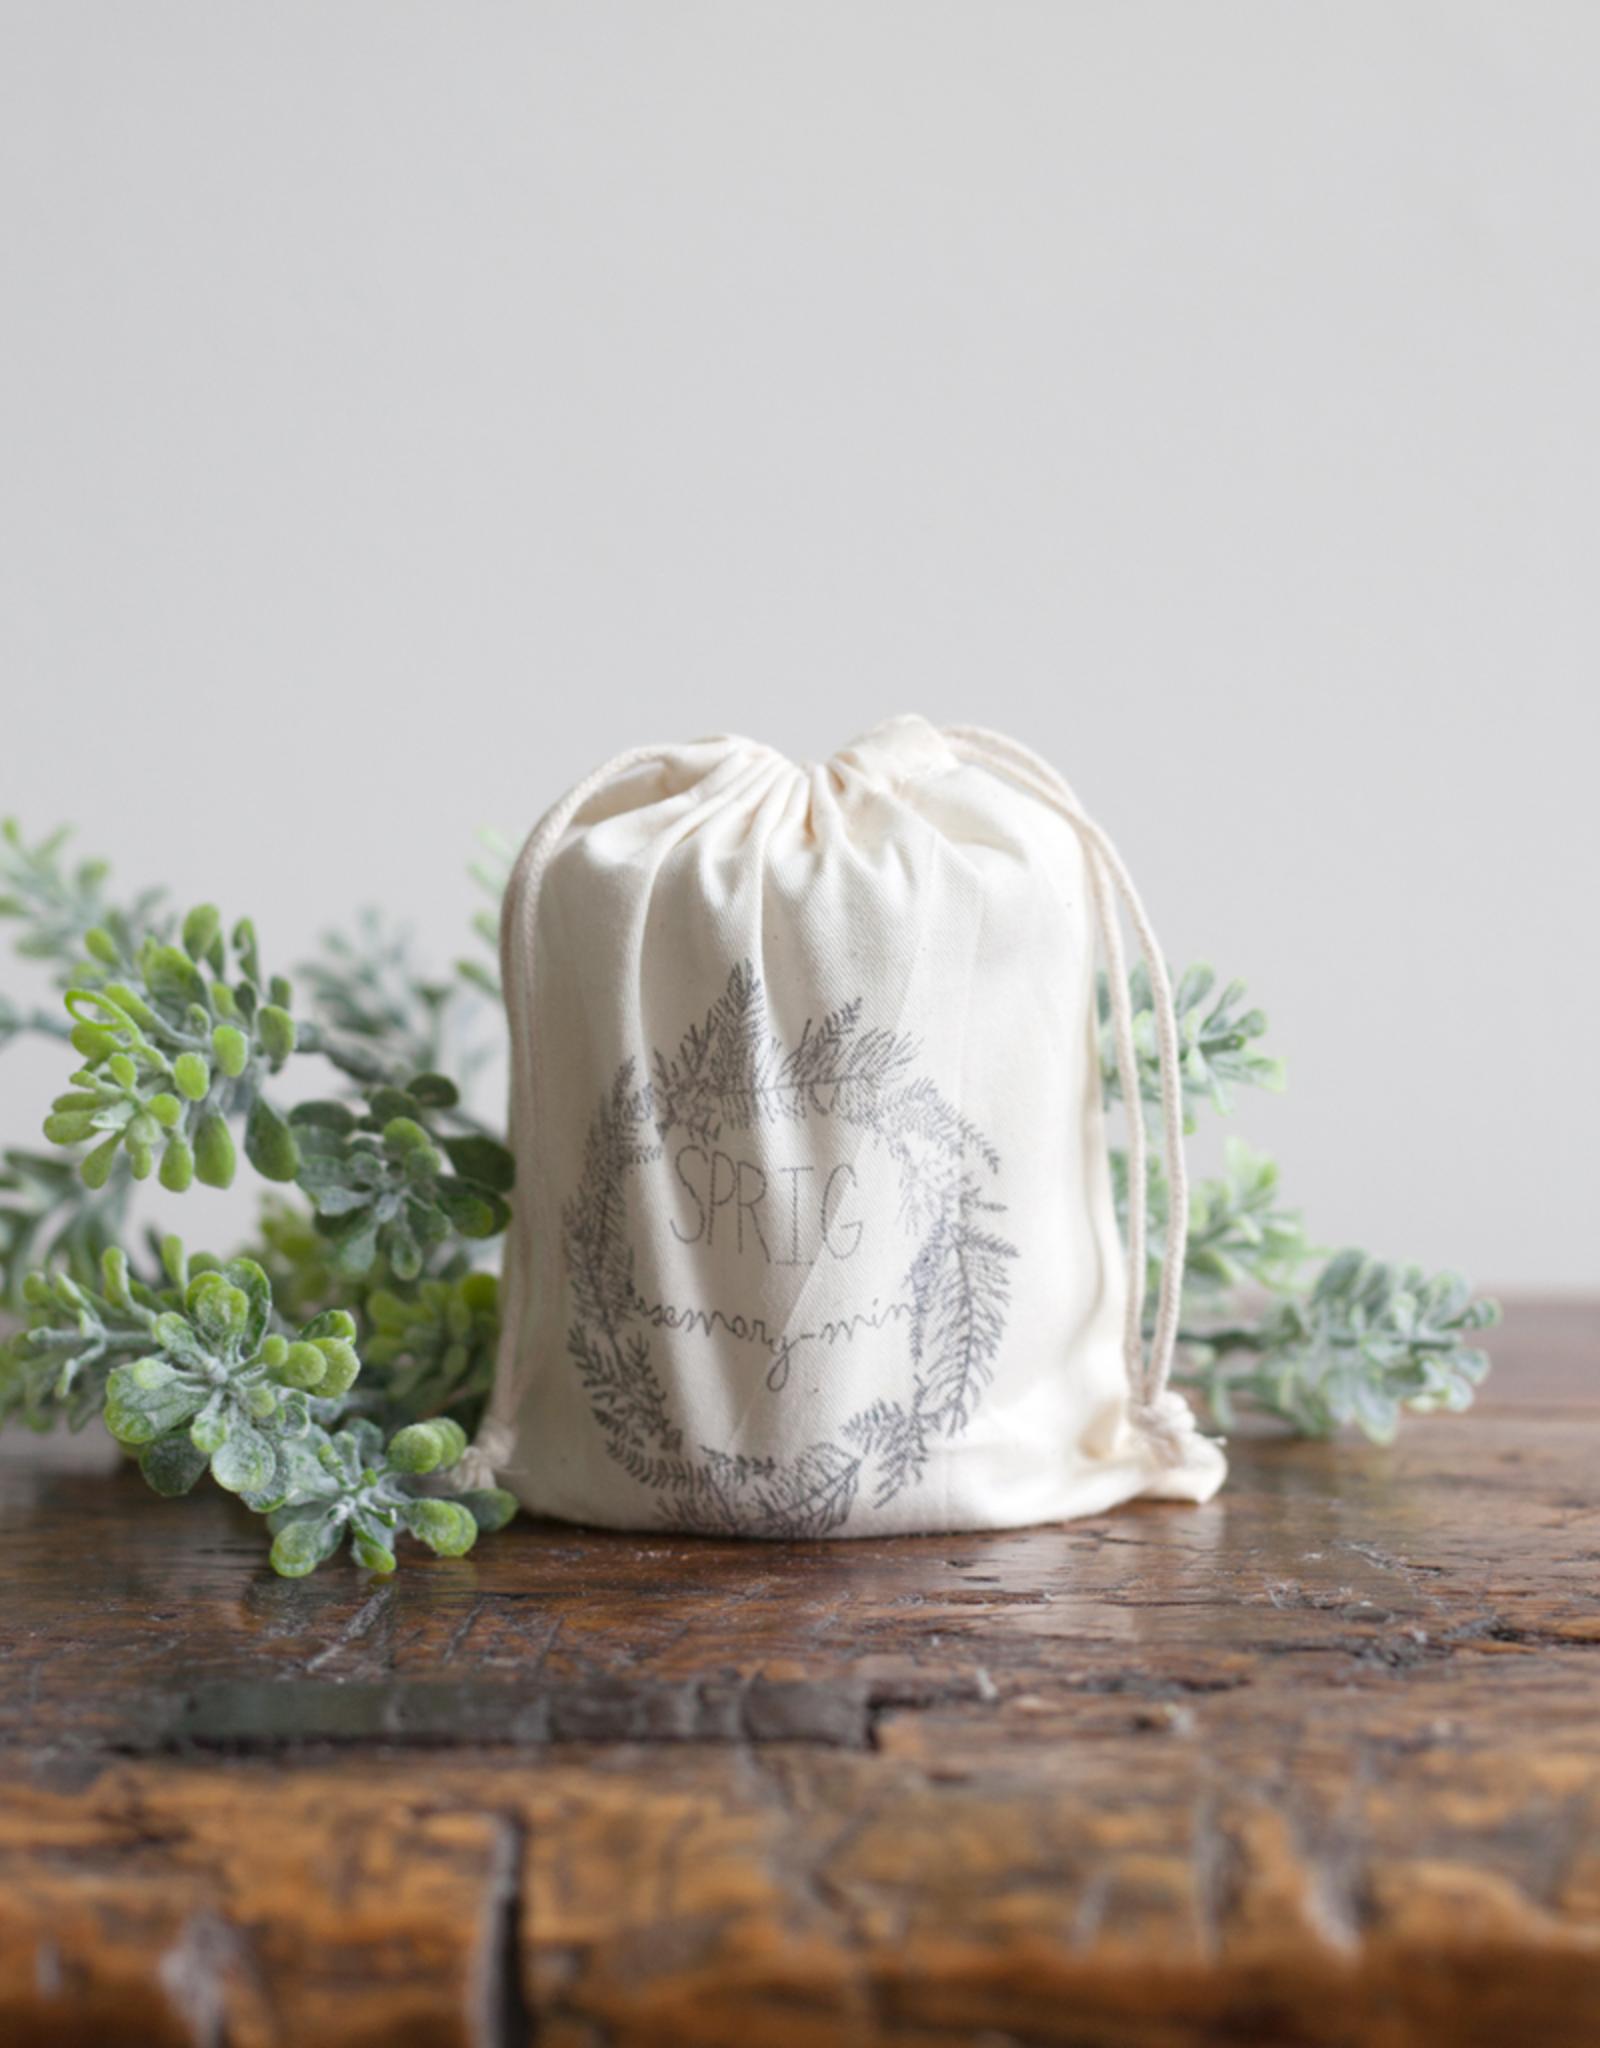 Handmade Sprig Coconut Wax Candle - Rosemary Mint